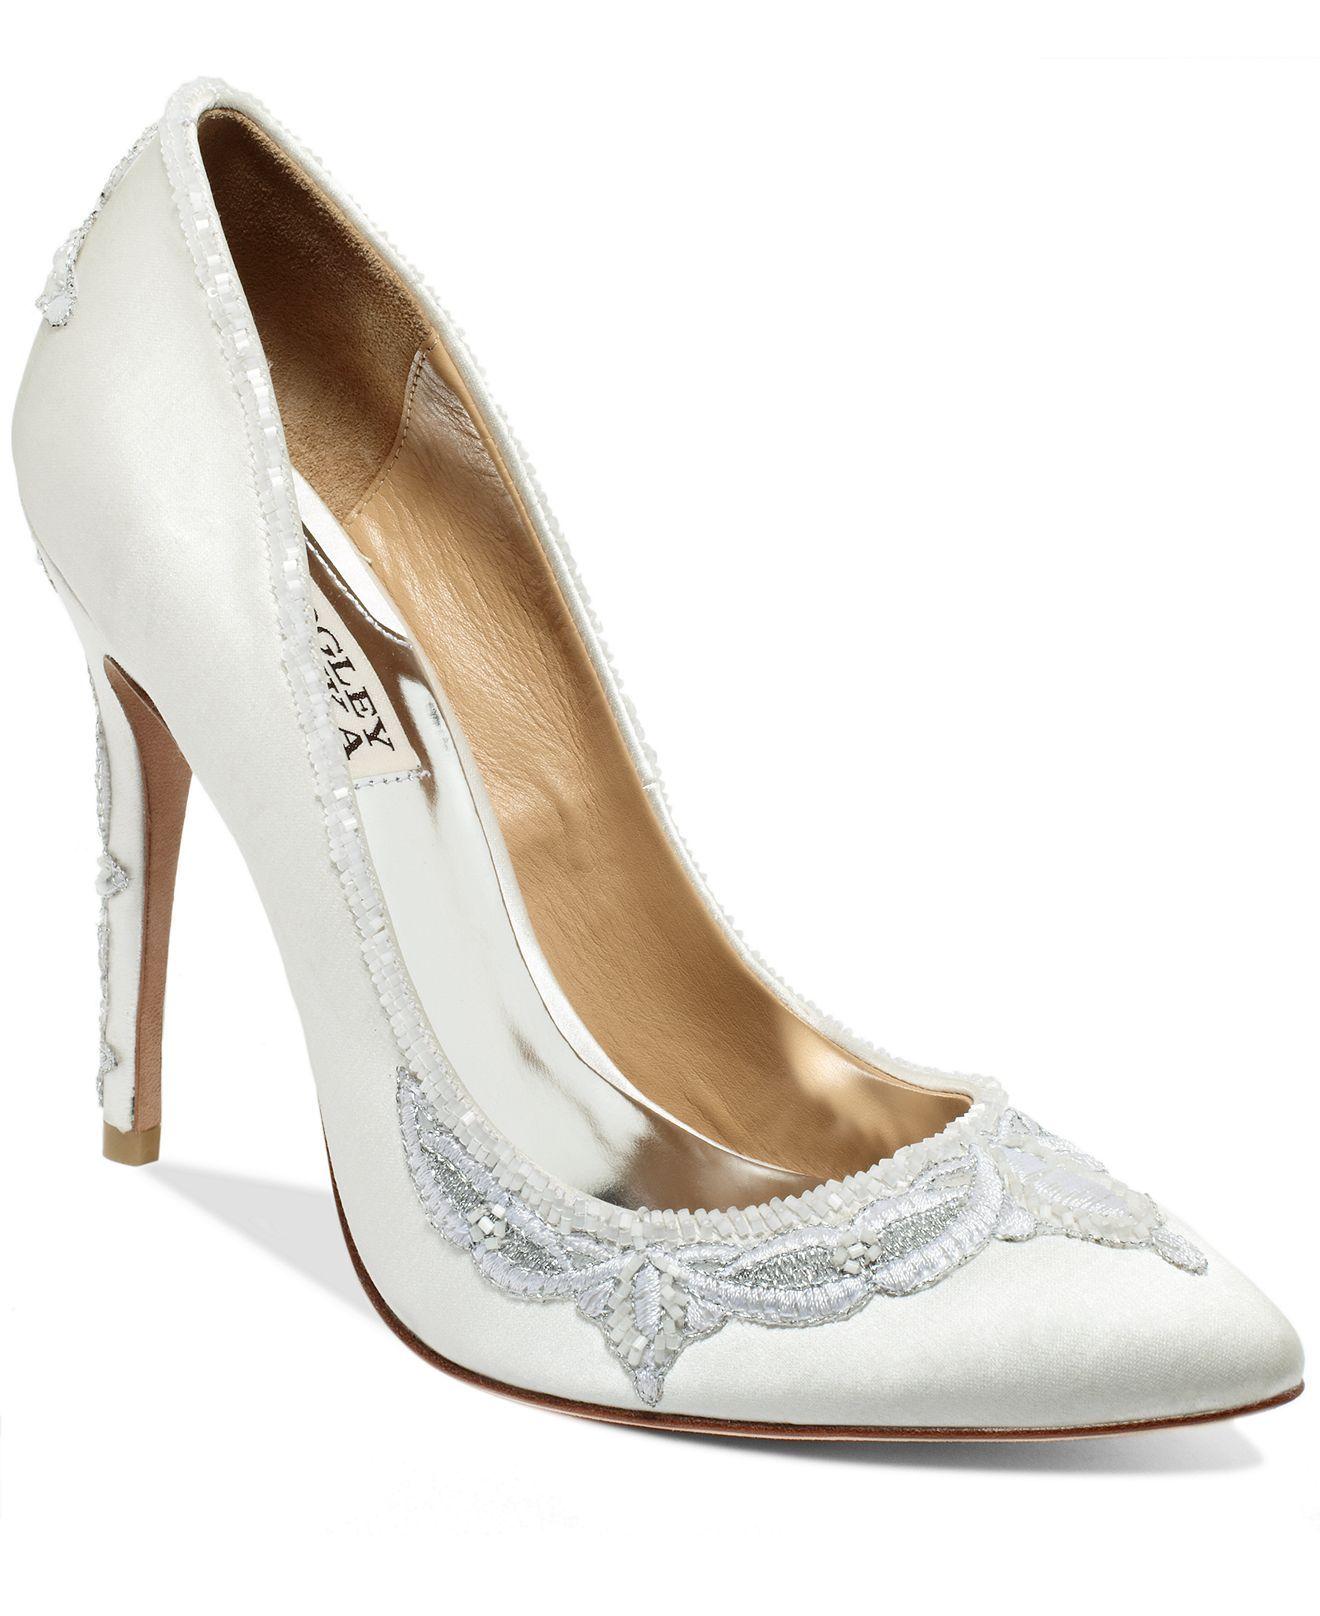 Badgley mischka balance evening pumps shoes macys